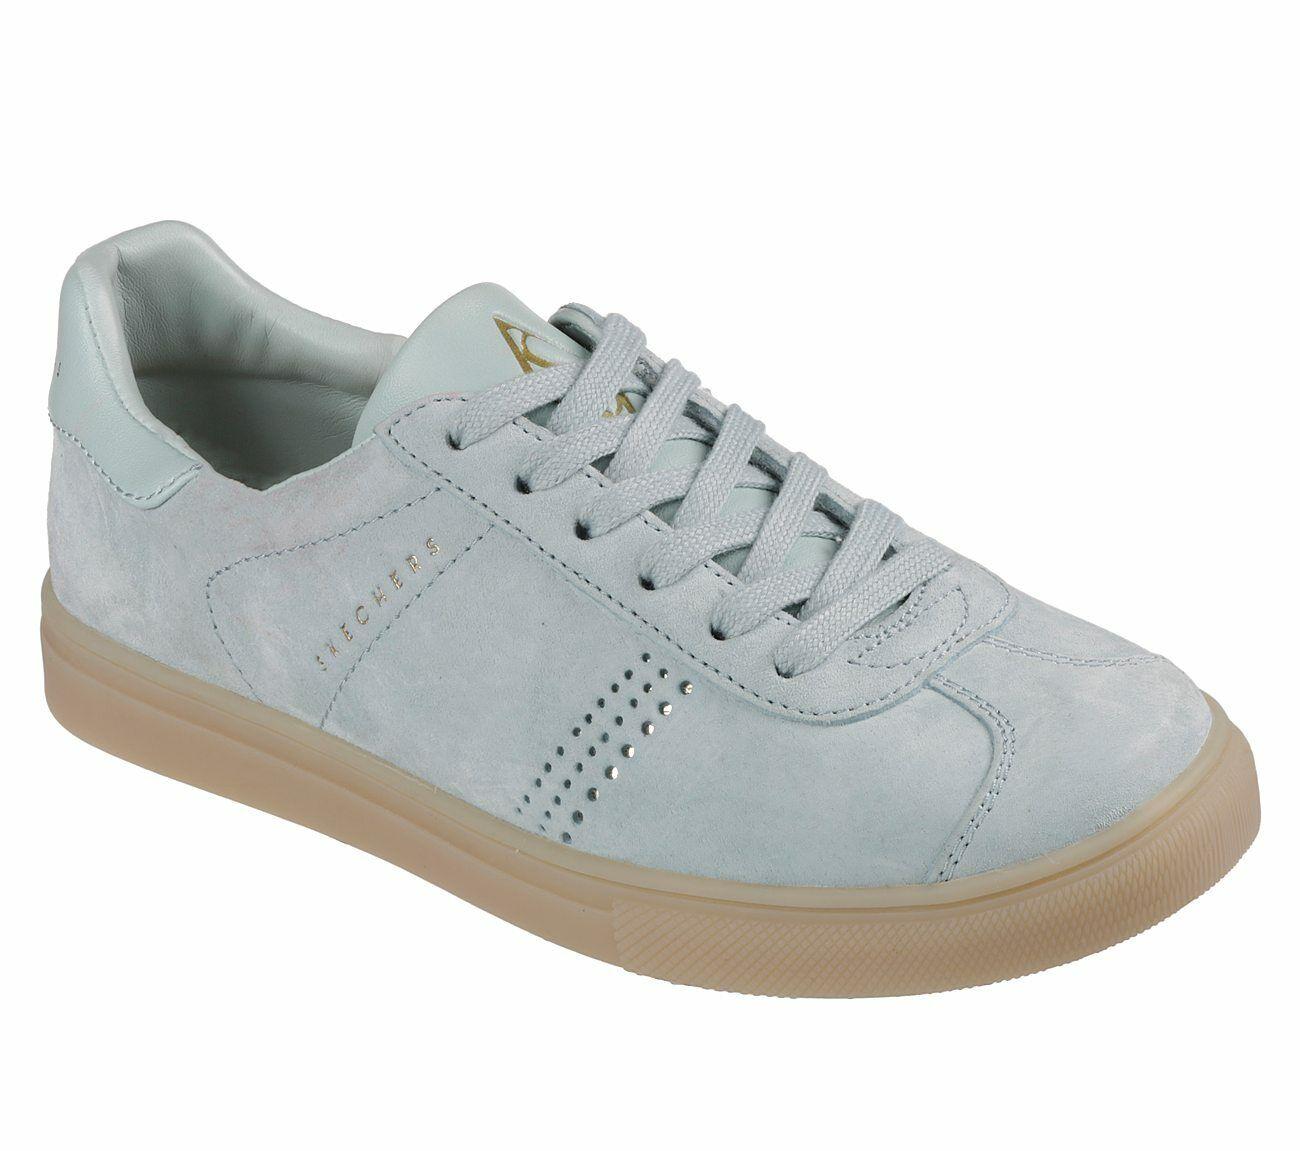 Weiß Sunday Herren Schuhe Herren Sportschuhe,Sunday